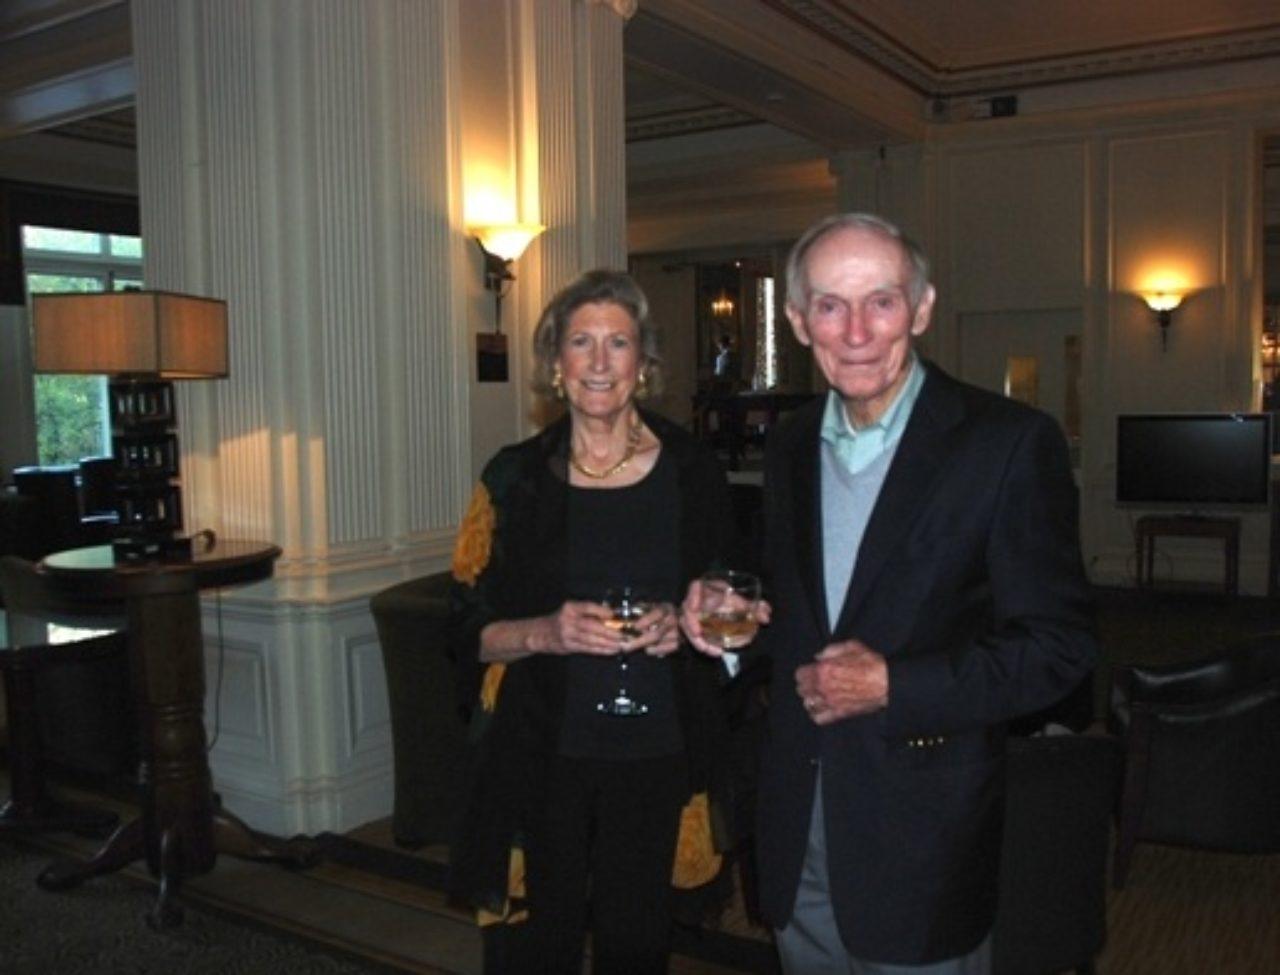 Edith Bingham and Al Shand at Caledonian Hotel